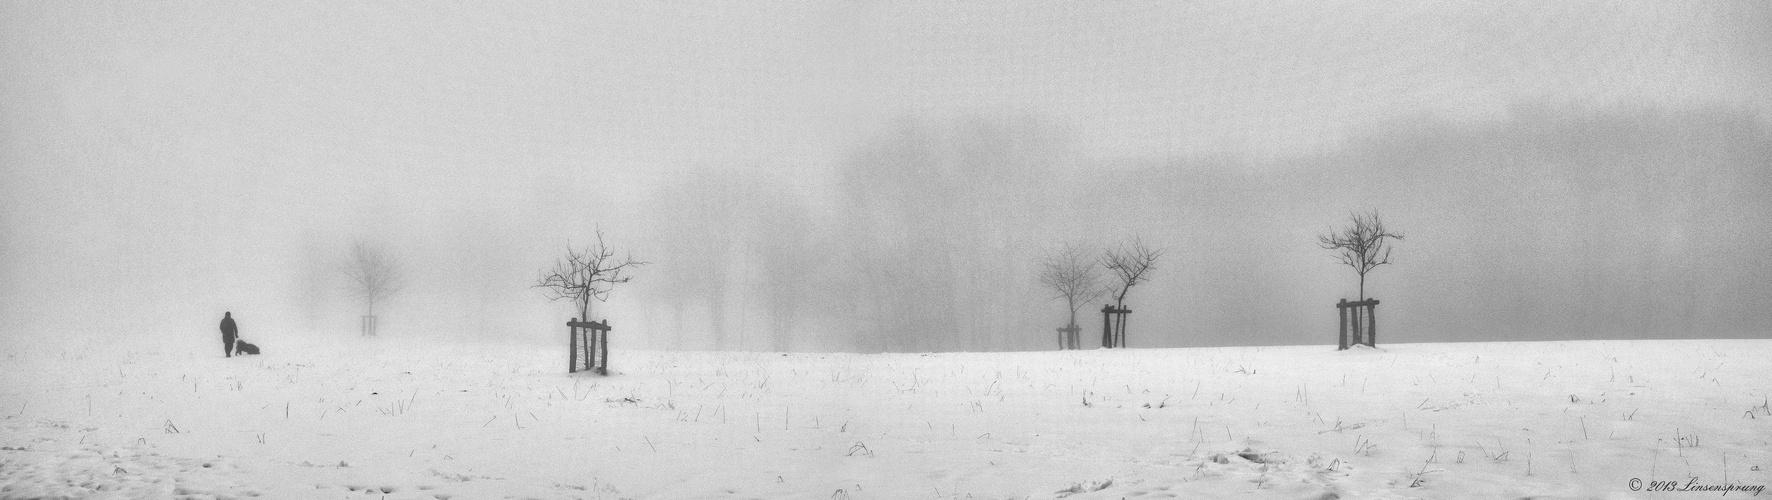 Winterspaziergang im Nebel